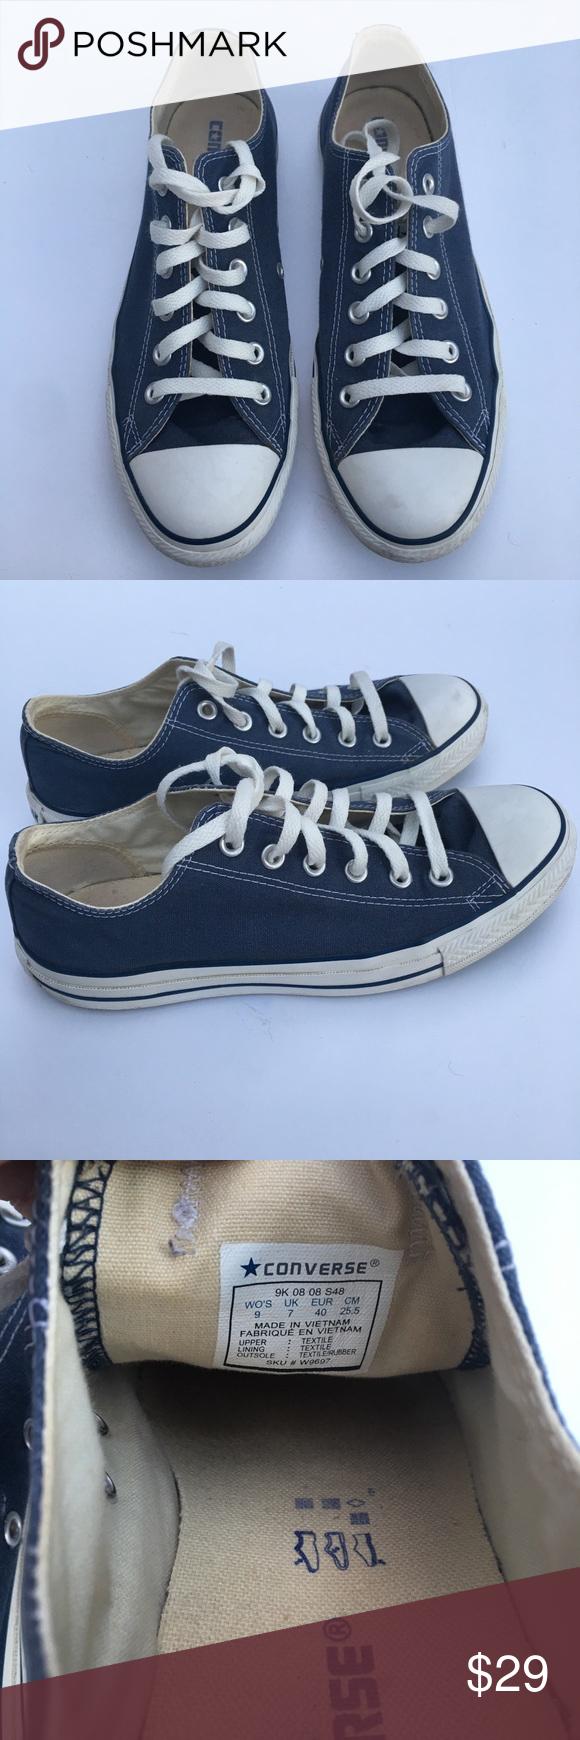 4552a17cbe82 Converse Womens Size 9 Blue Chuck Taylor Shoes Converse Womens Size 9 Blue  Canvas Chuck Taylor